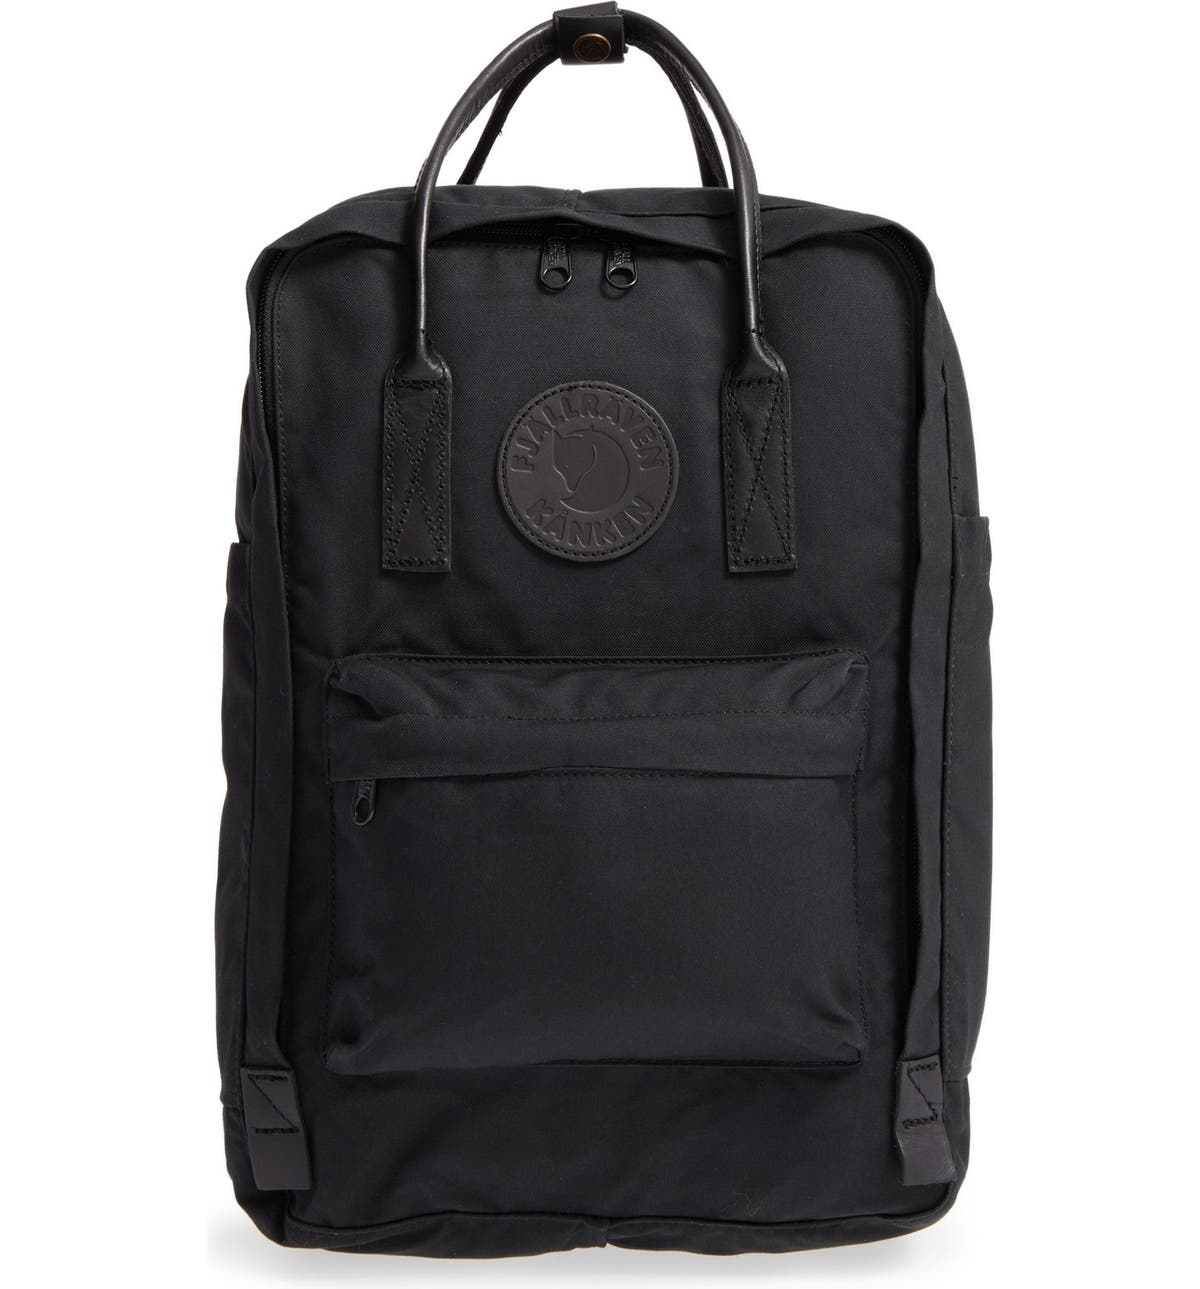 ce4808332 Fjällräven Kånken No. 2 Laptop Backpack | Nordstrom